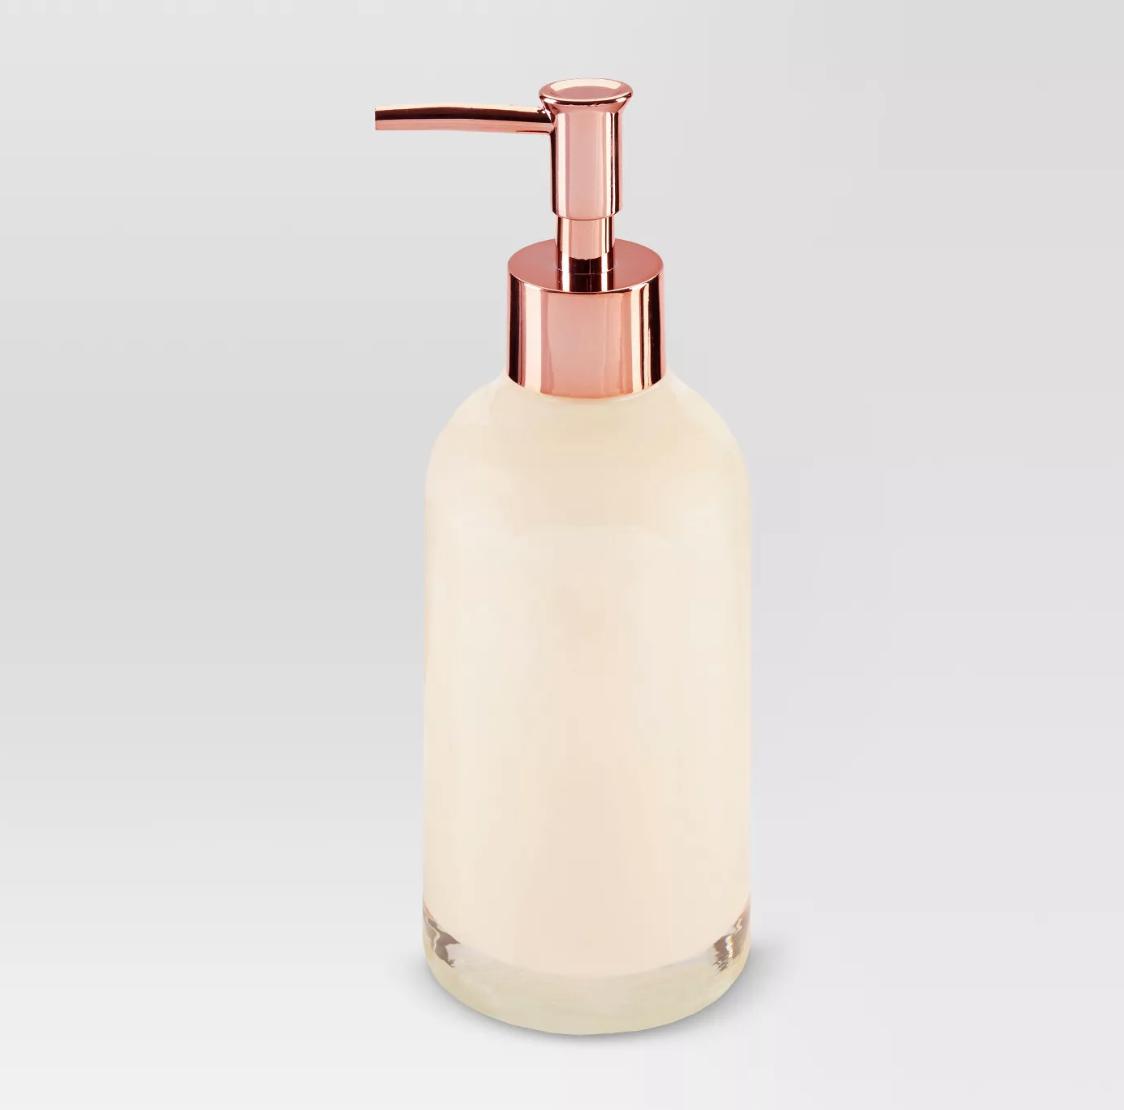 Pearlized Soap/lotion Dispenser Medium Beige - Threshold™